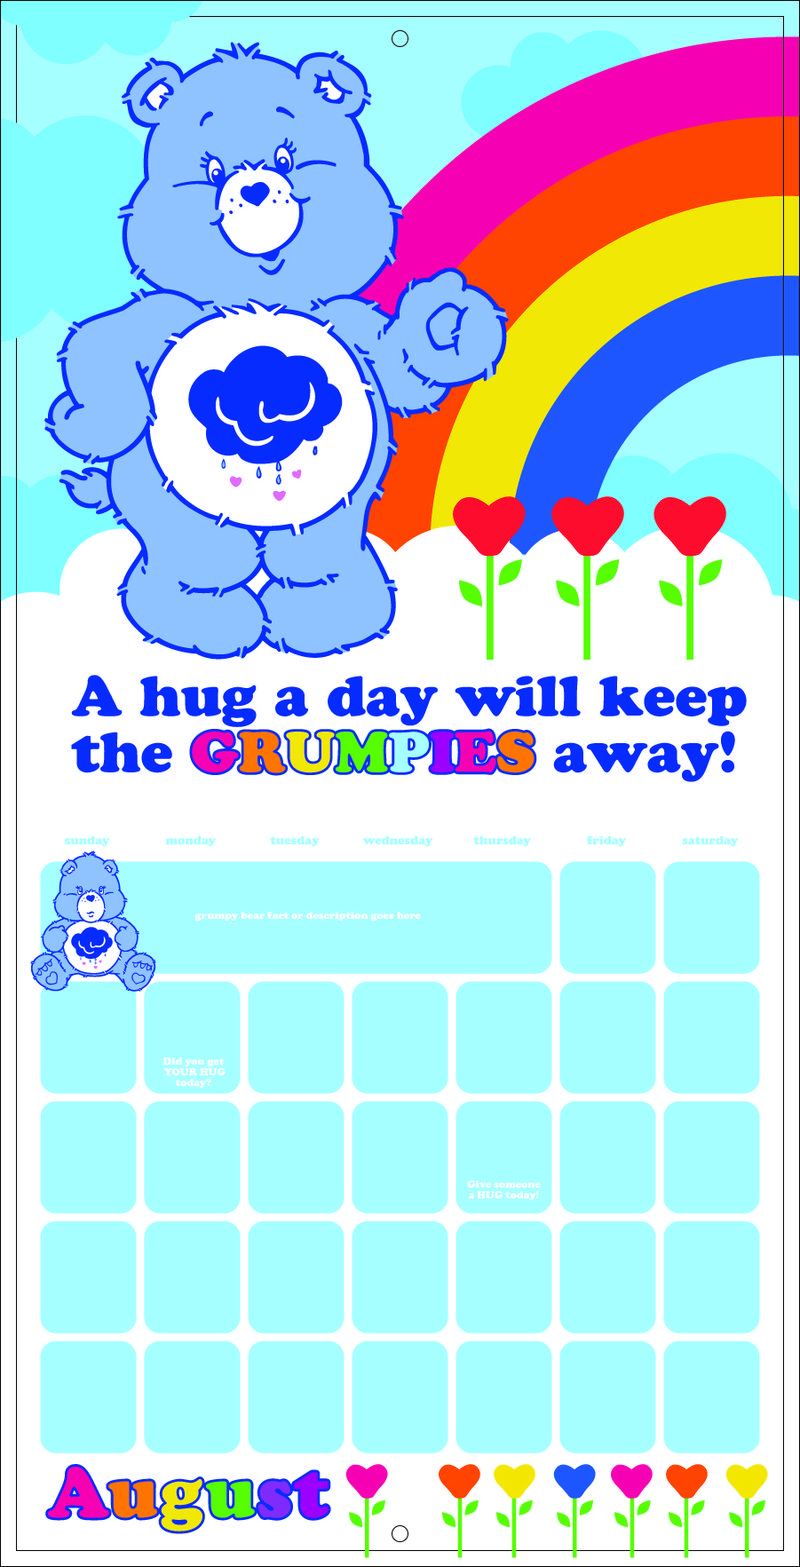 Grumpy calendar concept